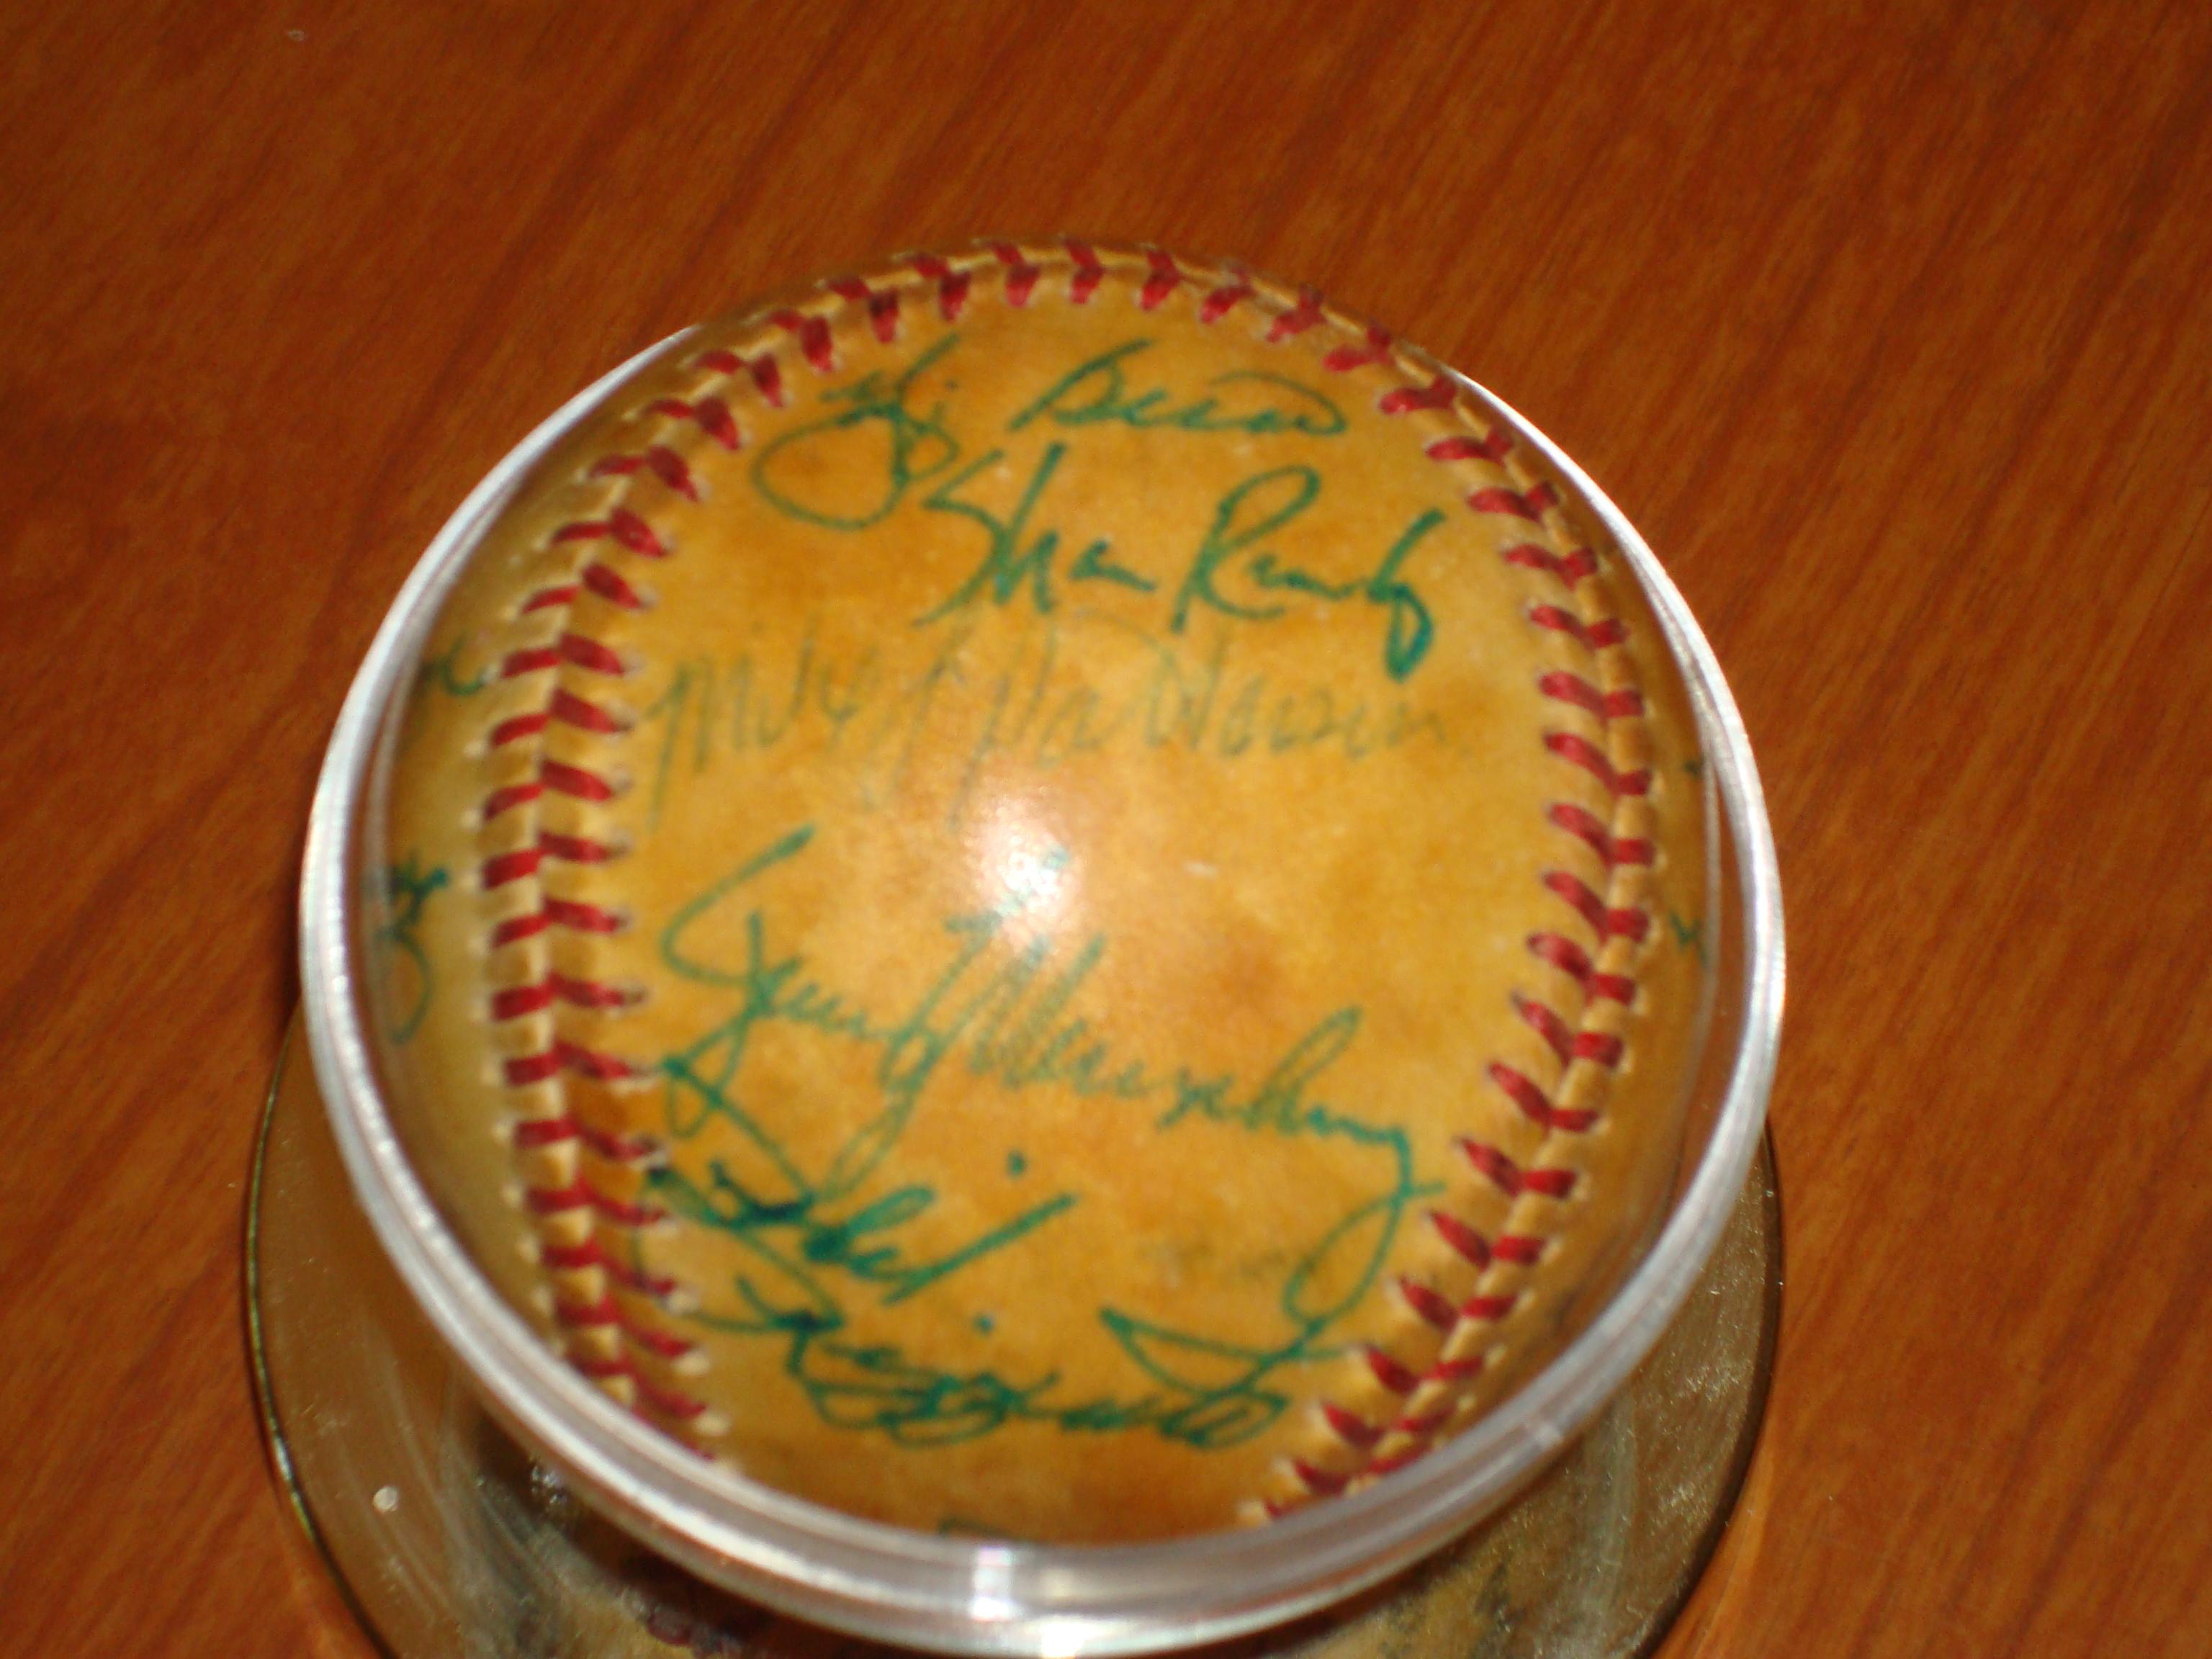 1978 World Champion New York Yankee Autographed Team Ball - Yogi Berra, Phil Rizzuto, Shane Rawley